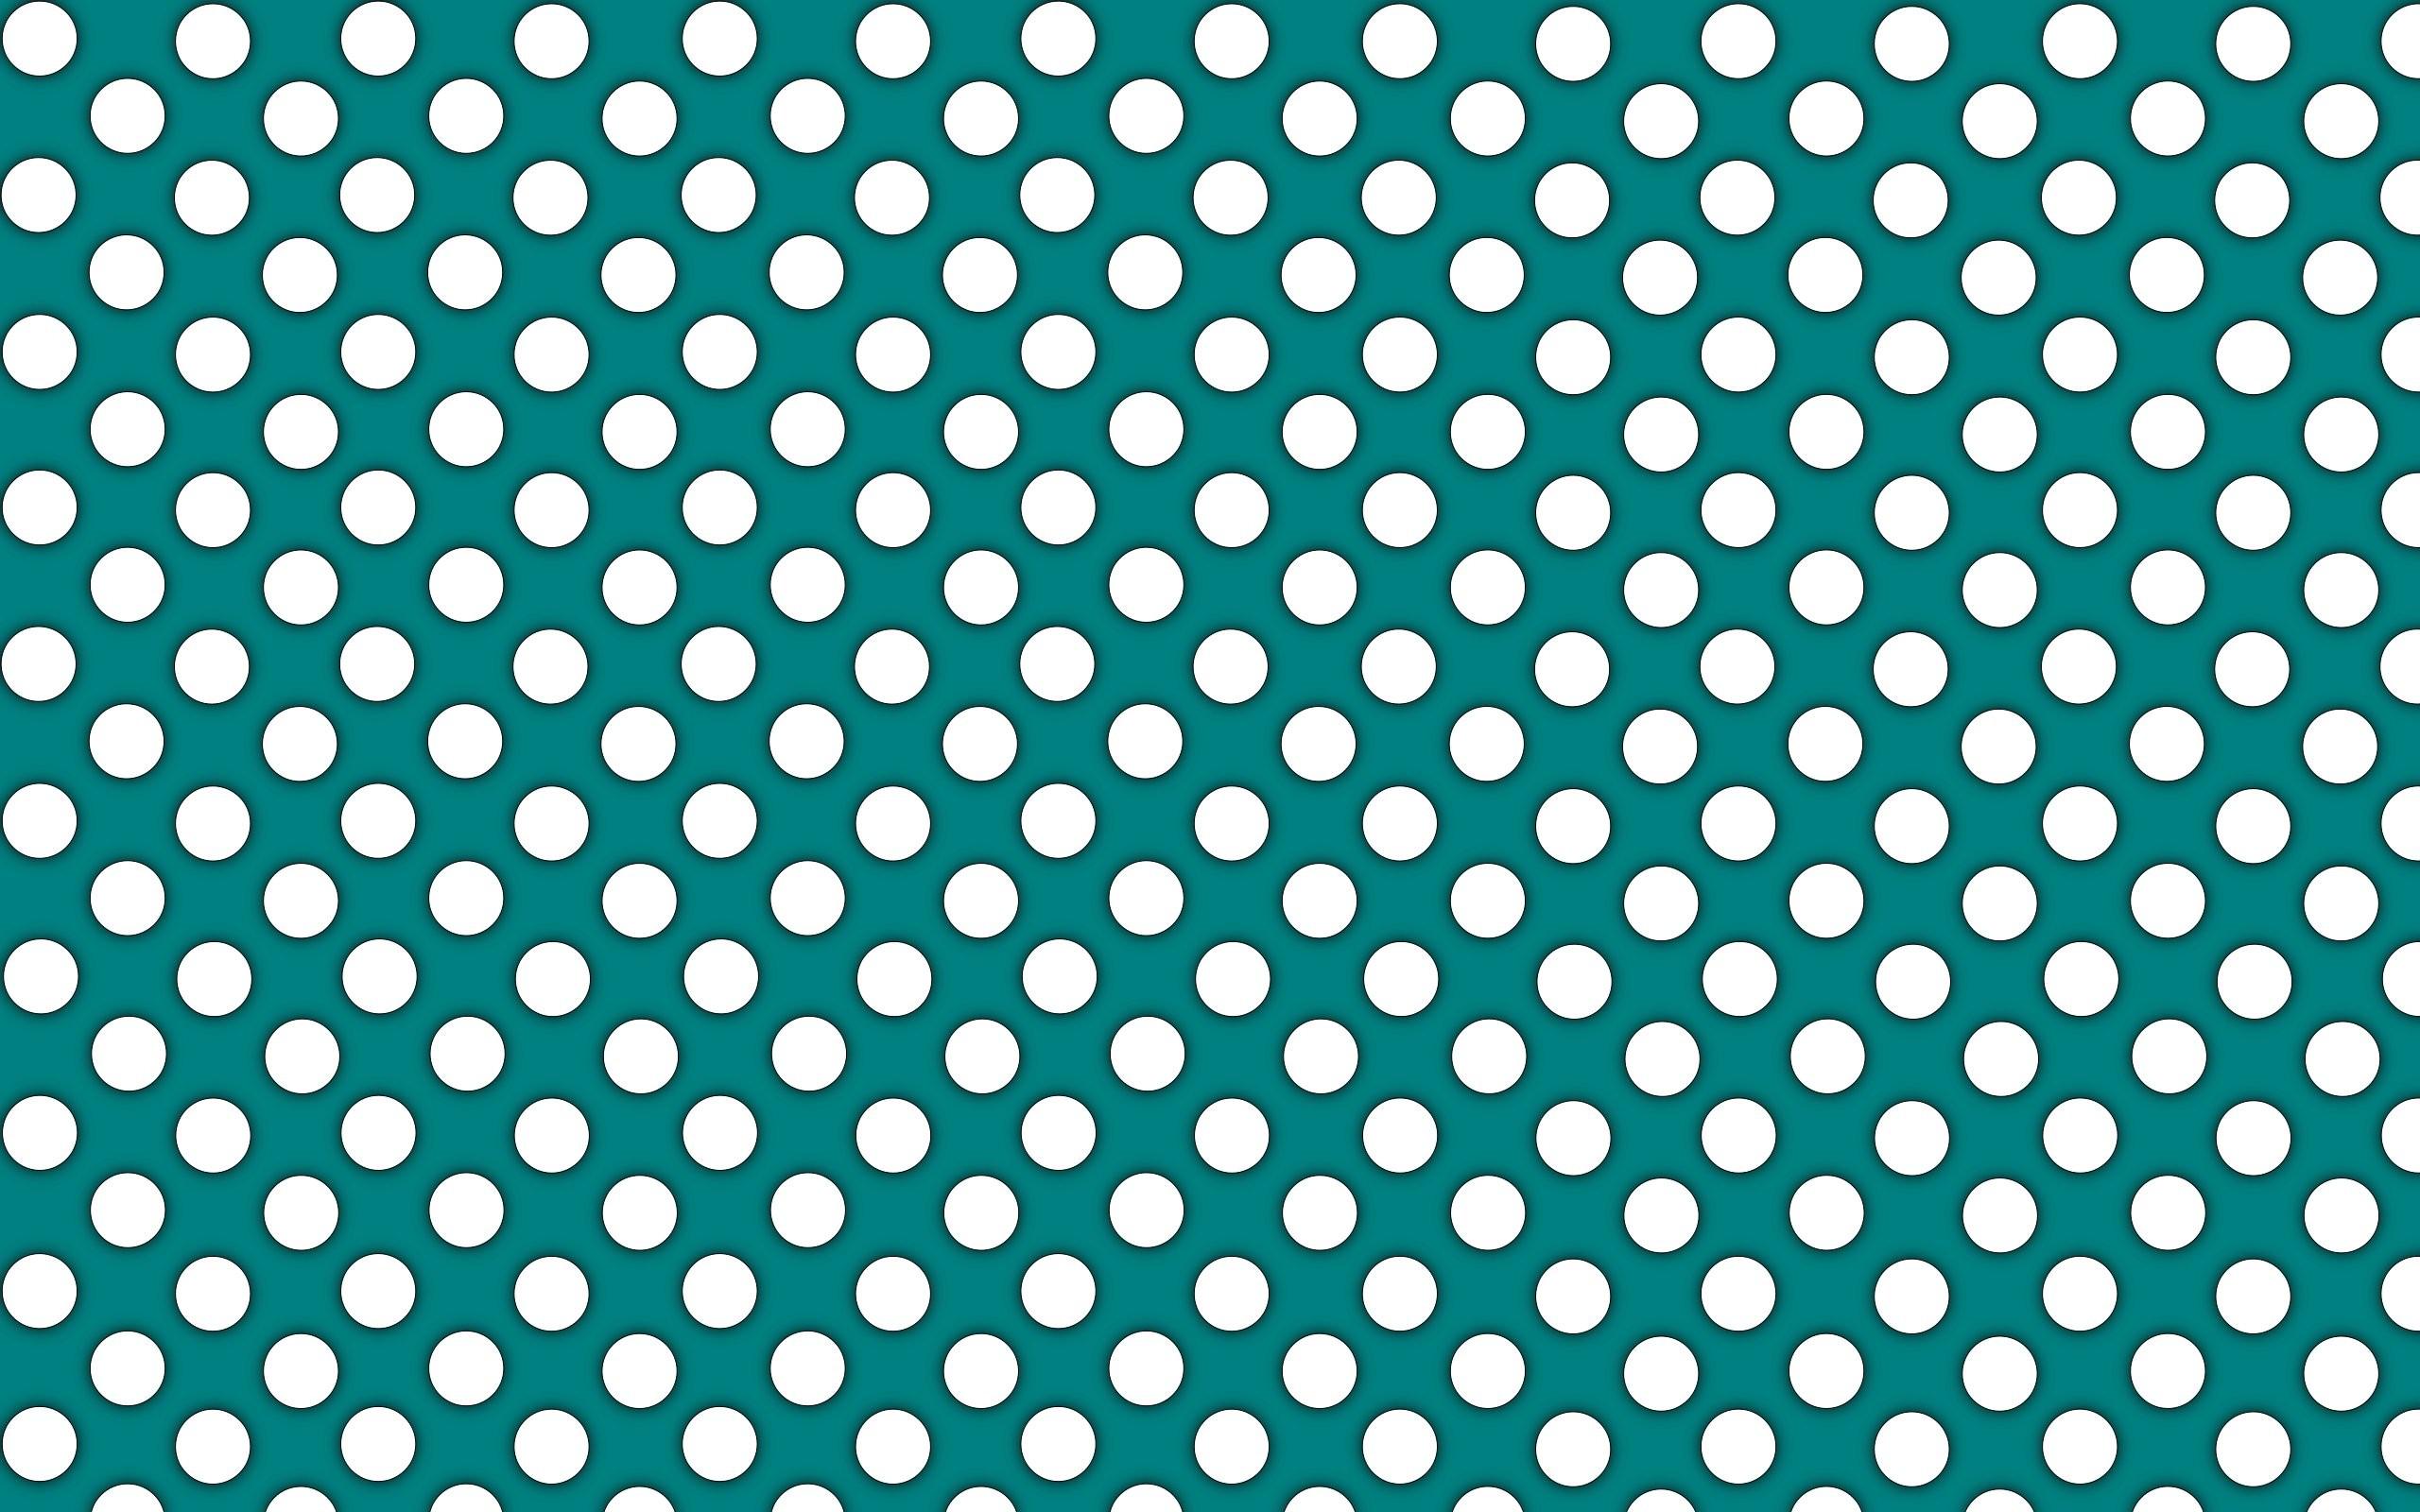 Dot Wallpapers – Full HD wallpaper search